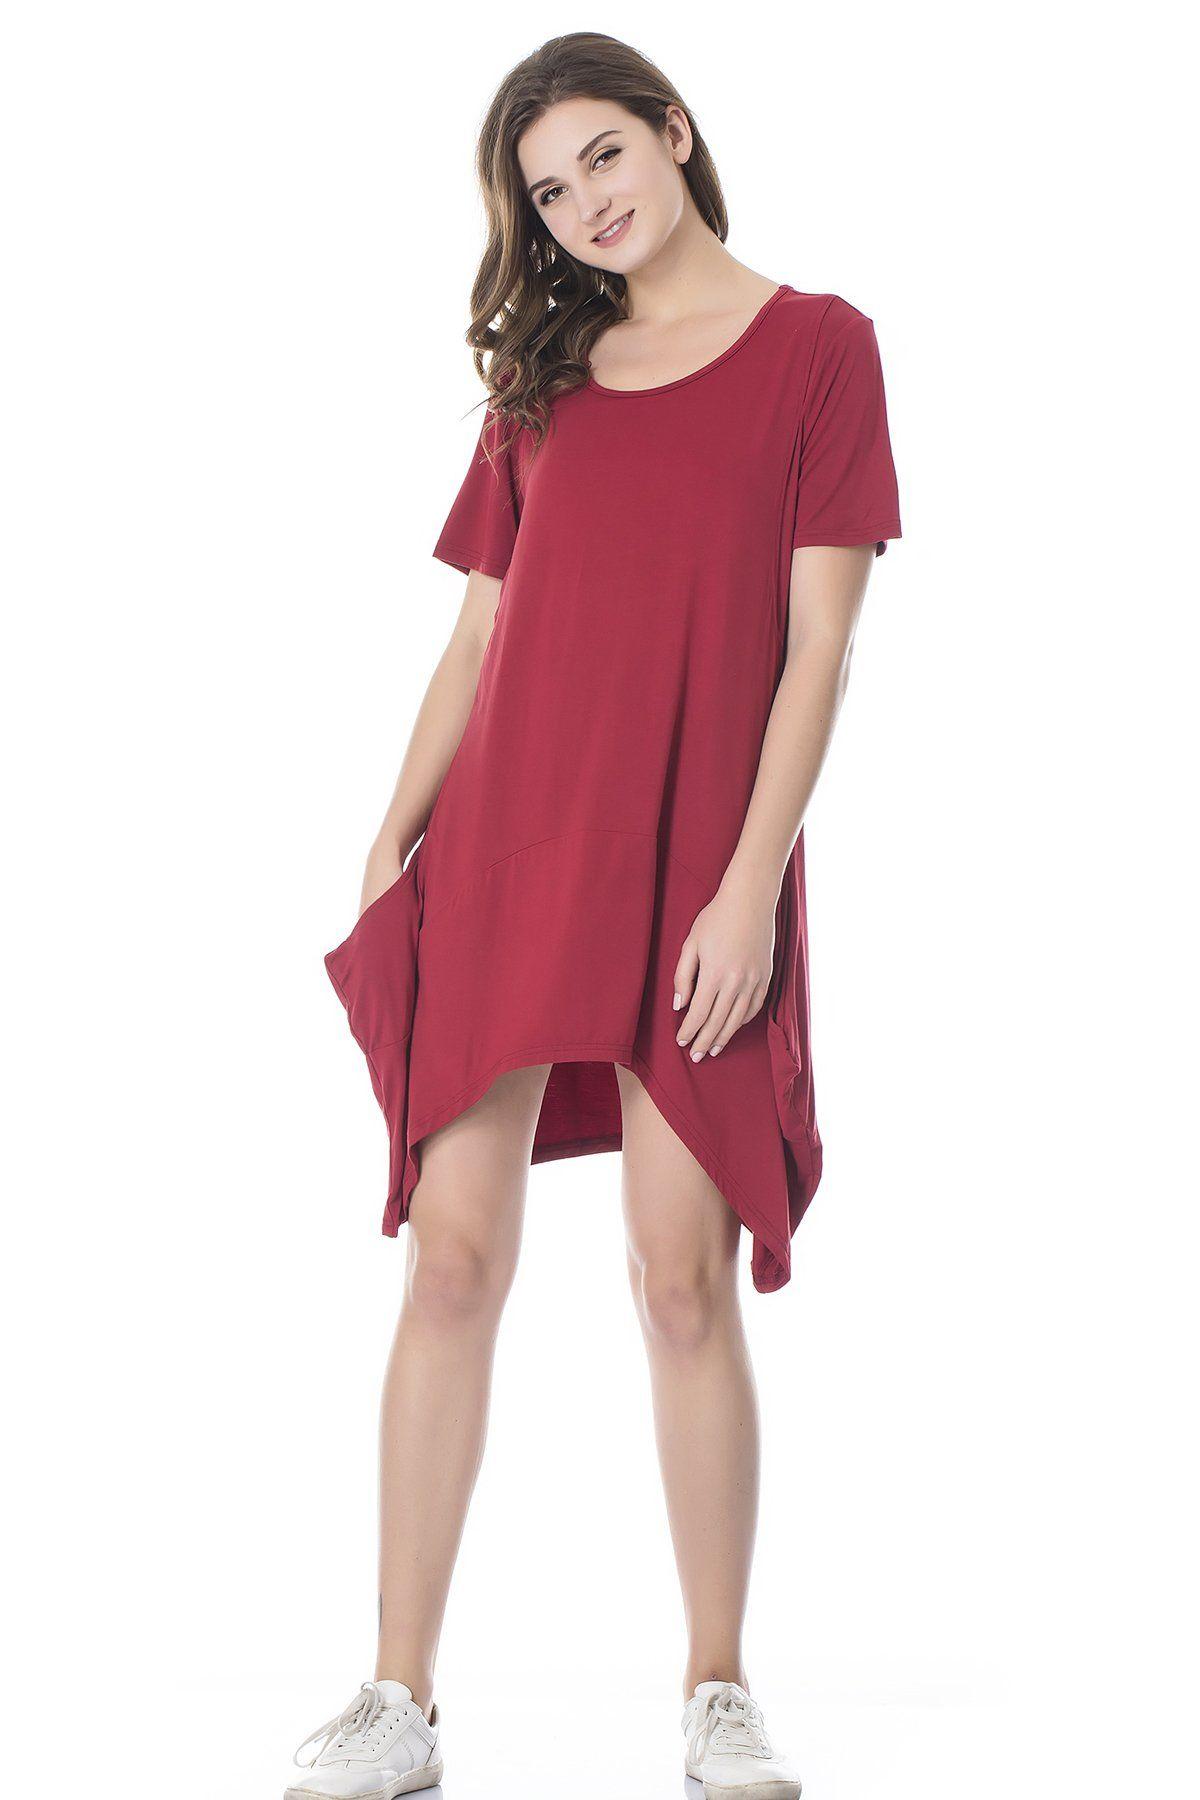 1853ea8e859e3 Maternity Styles - skinny maternity maxi dress : Bearsland Womens Maternity  Short Sleeves Summer Breastfeeding Nursing Dresses Wine Red M ** You could  ...